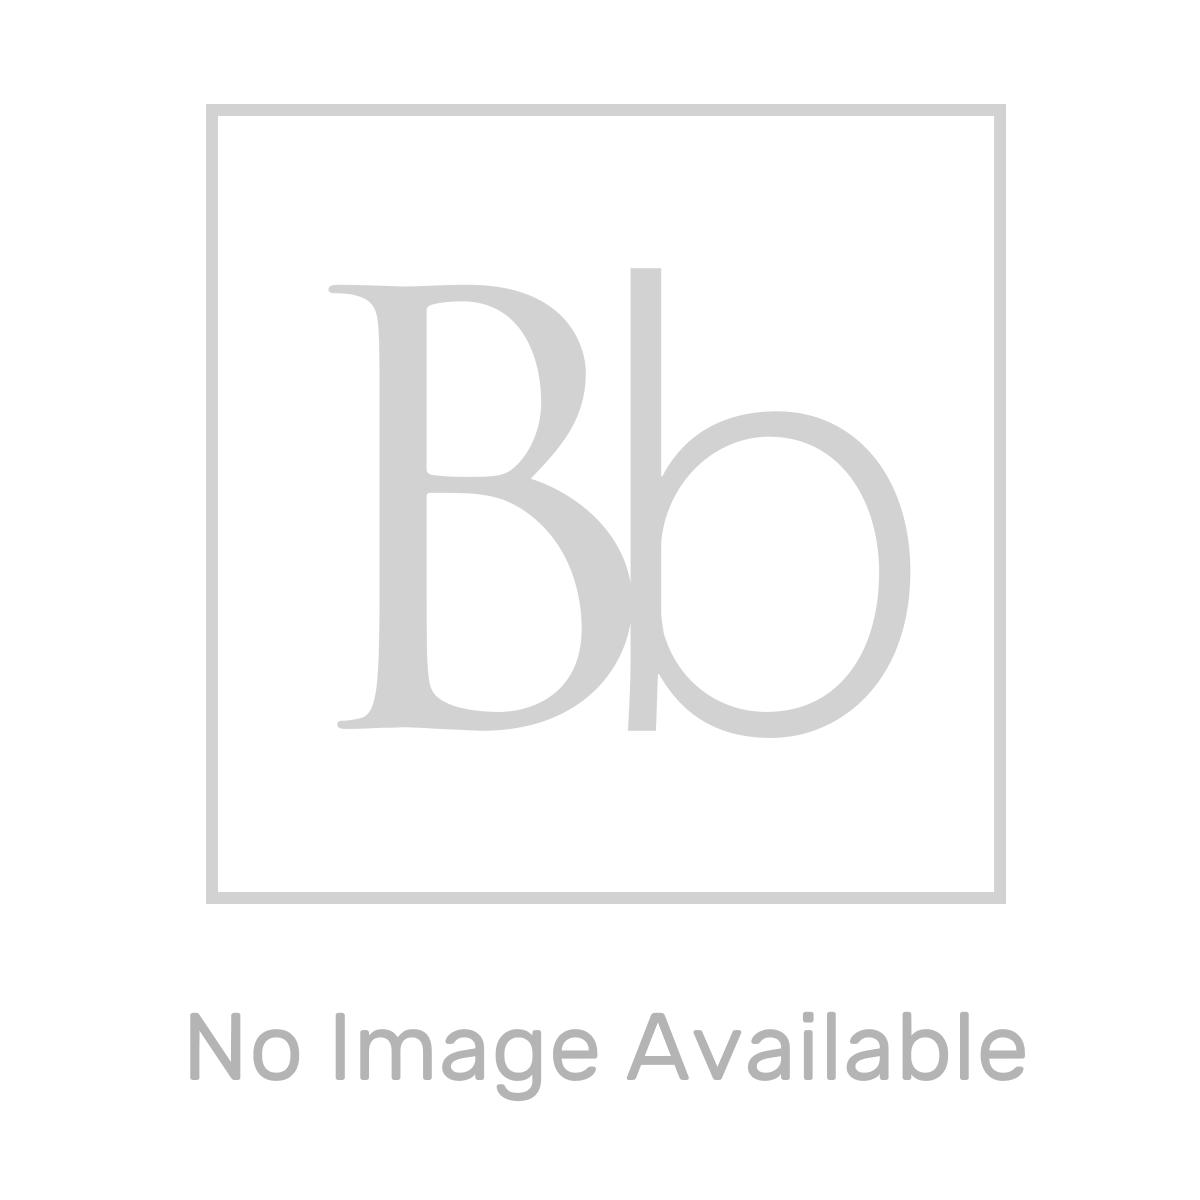 Frontline Holborn Low Level Toilet